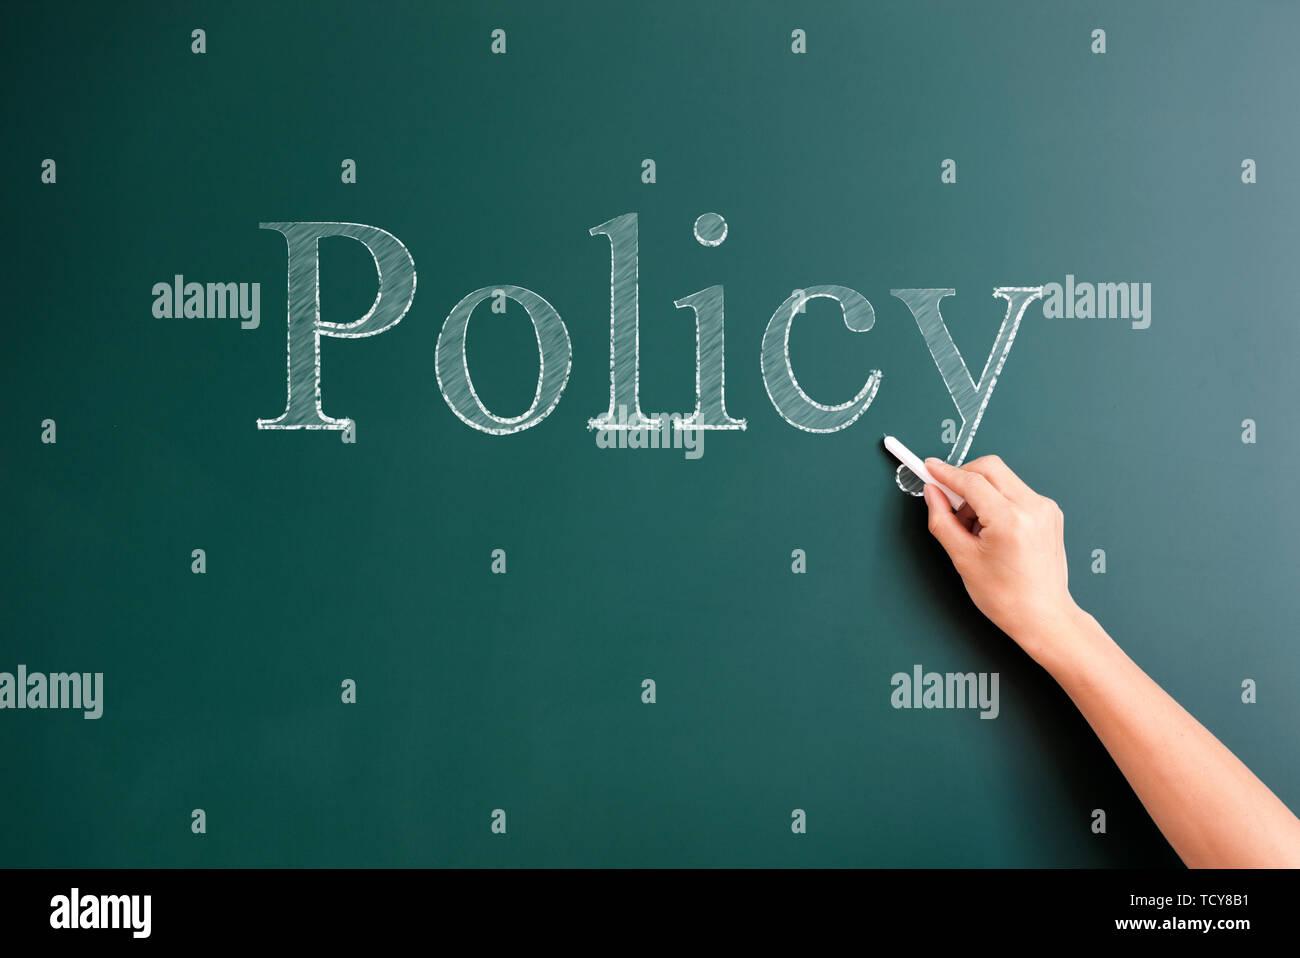 policy written on blackboard - Stock Image